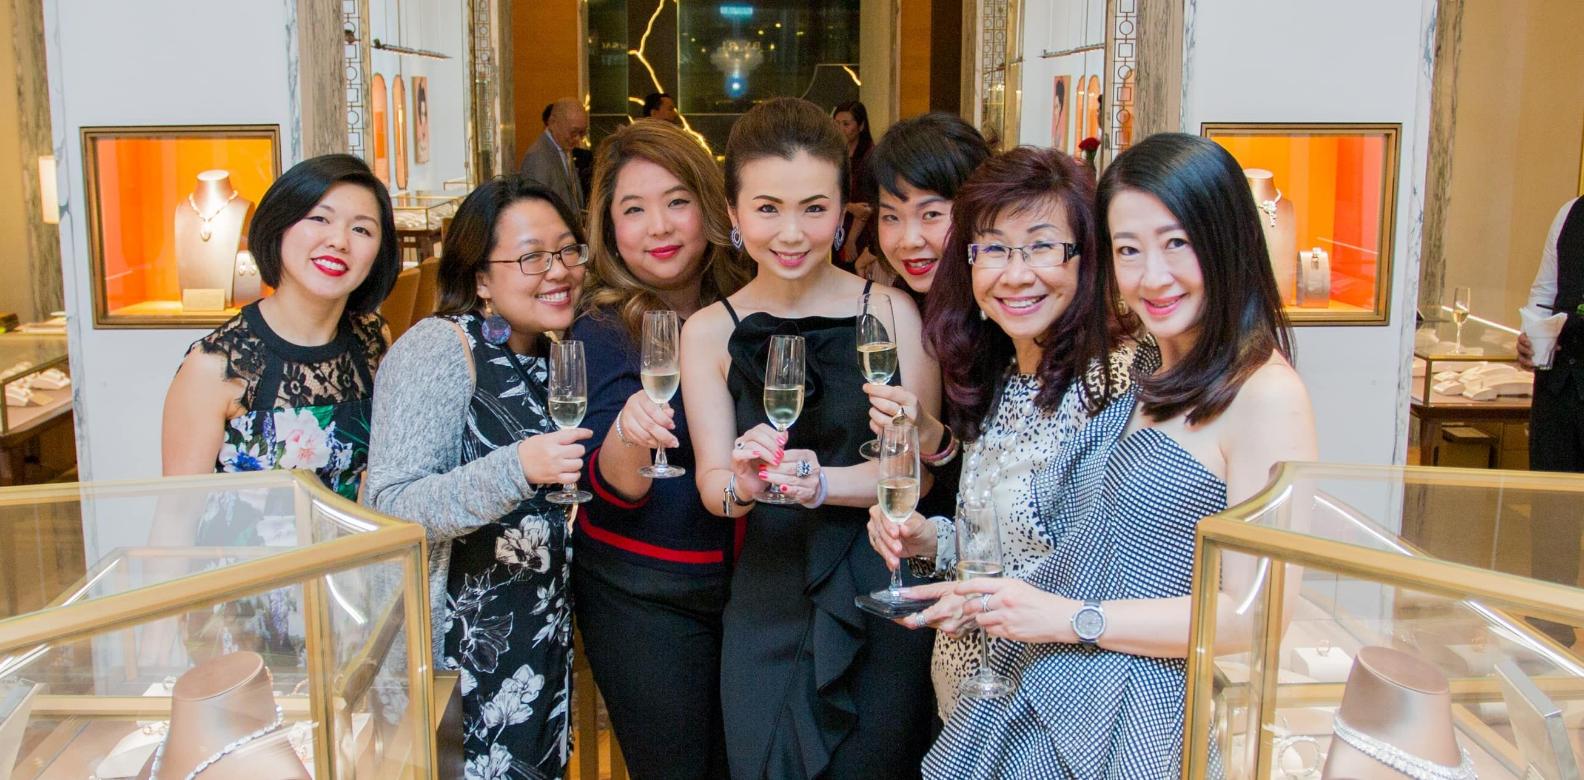 June Tan, Lily Ong, Yap Ai Leen, Pauline Gan, Teo Sze Lin, Florence Fang and Christine Cheah